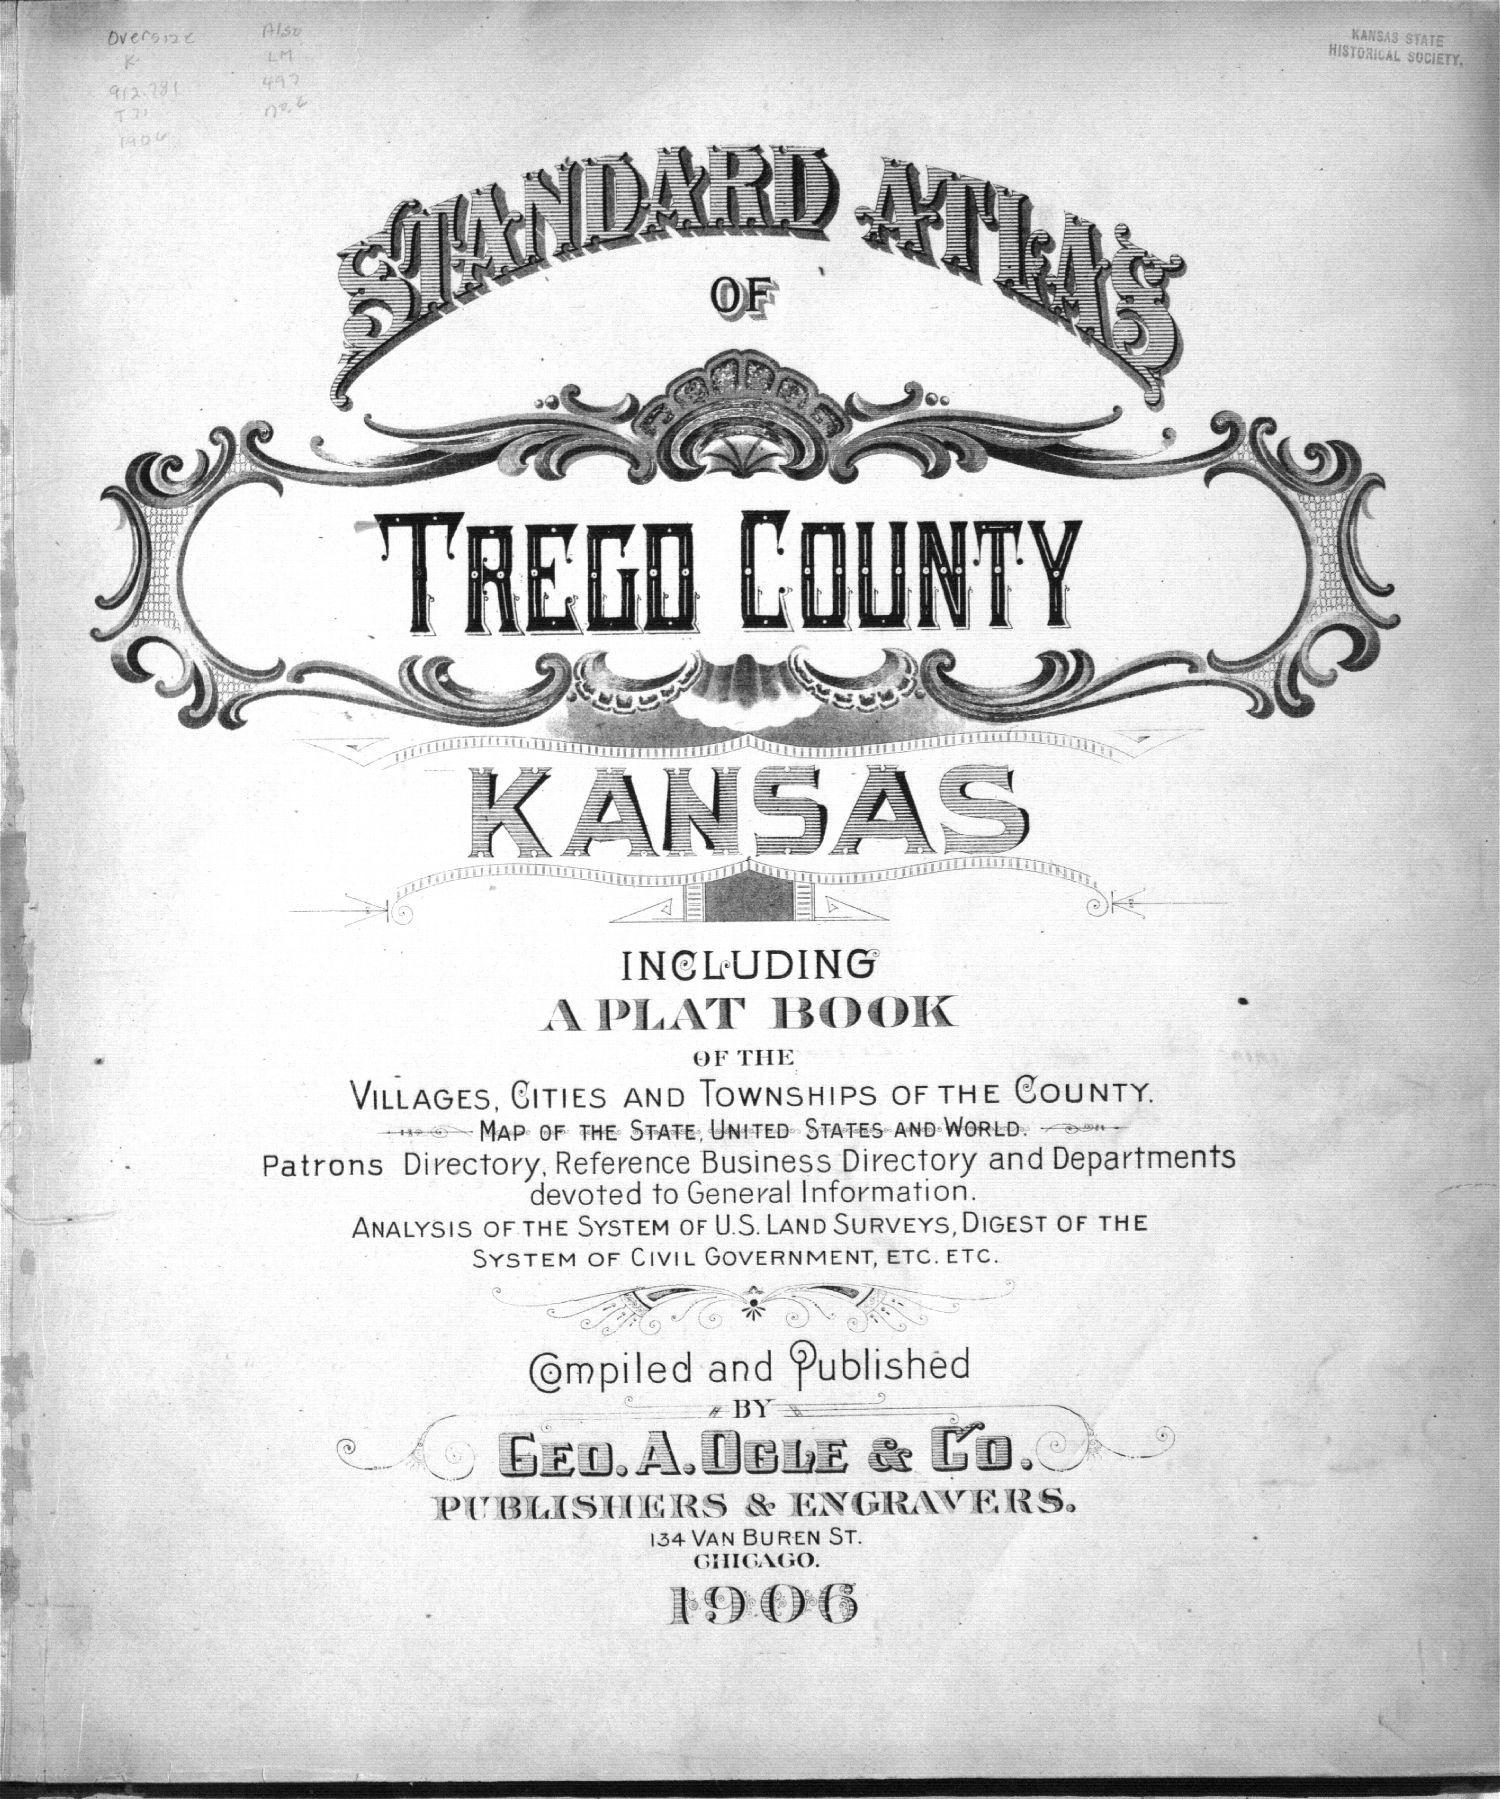 Standard atlas of Trego County, Kansas - 3